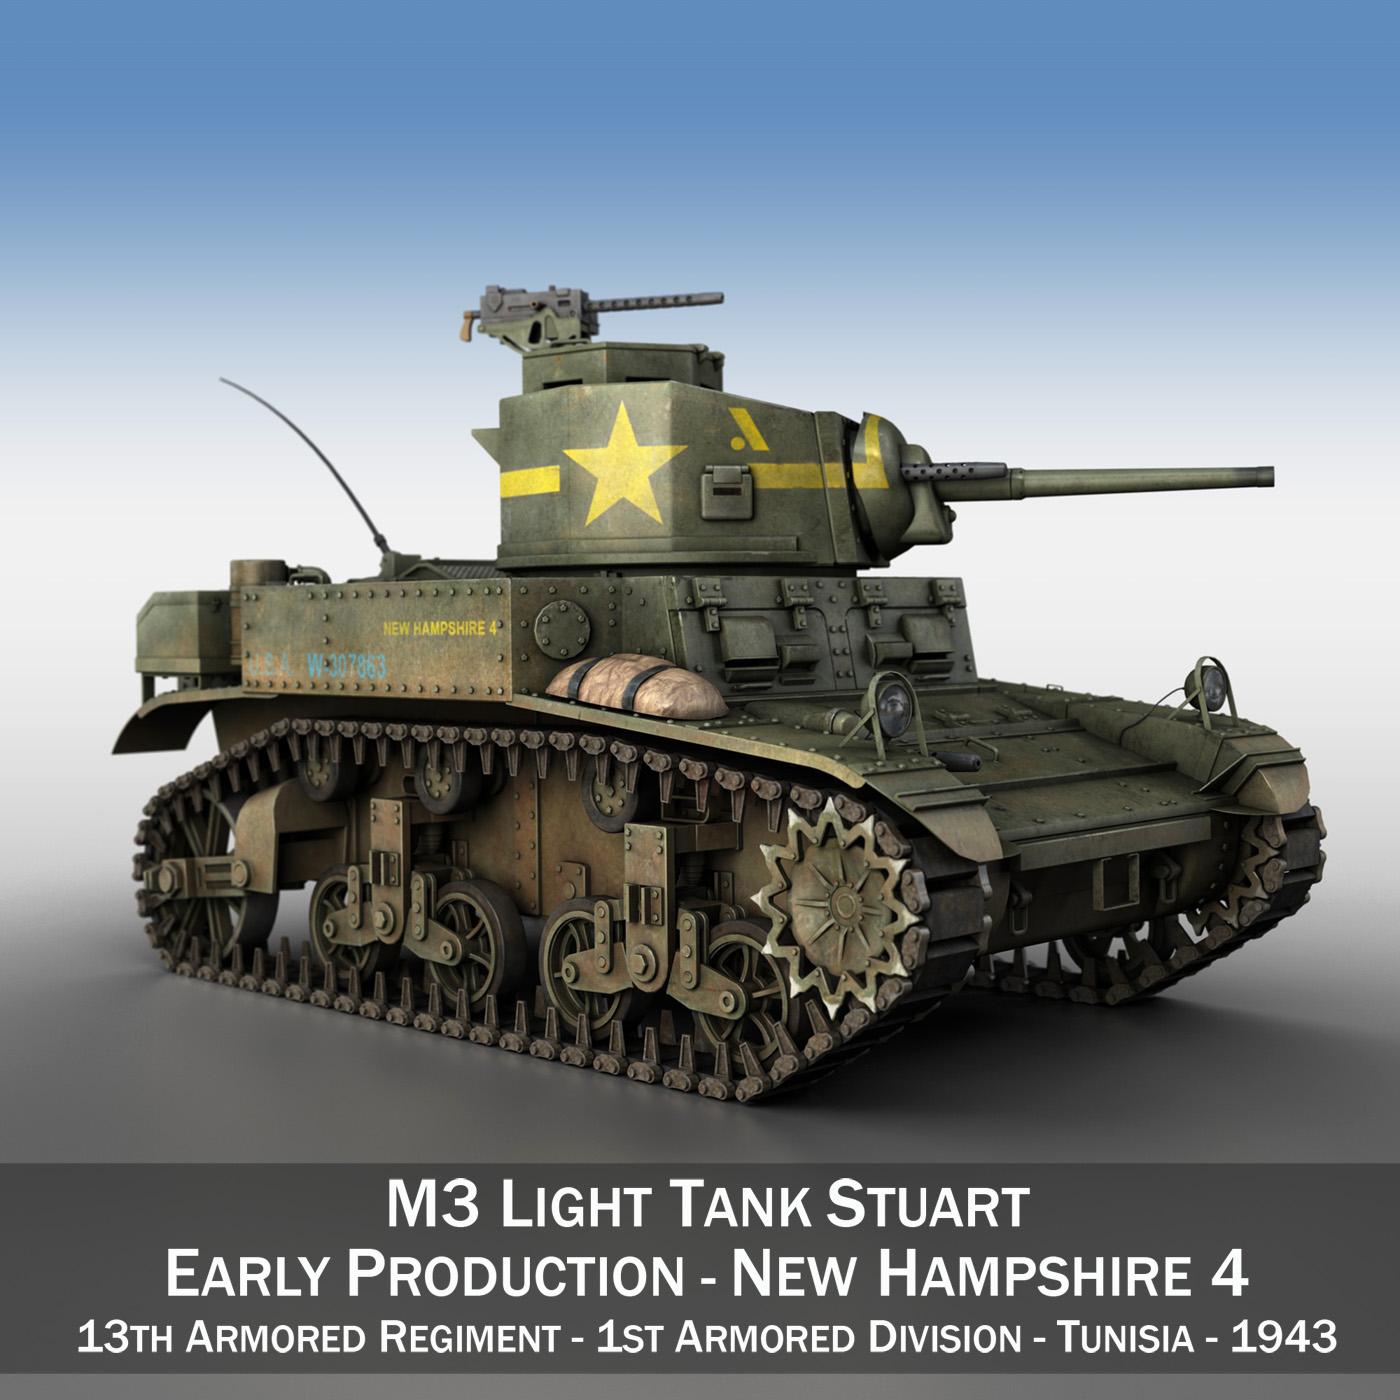 m3 light tank stuart – new hampshire 4 3d model 3ds c4d fbx lwo lw lws obj 266373